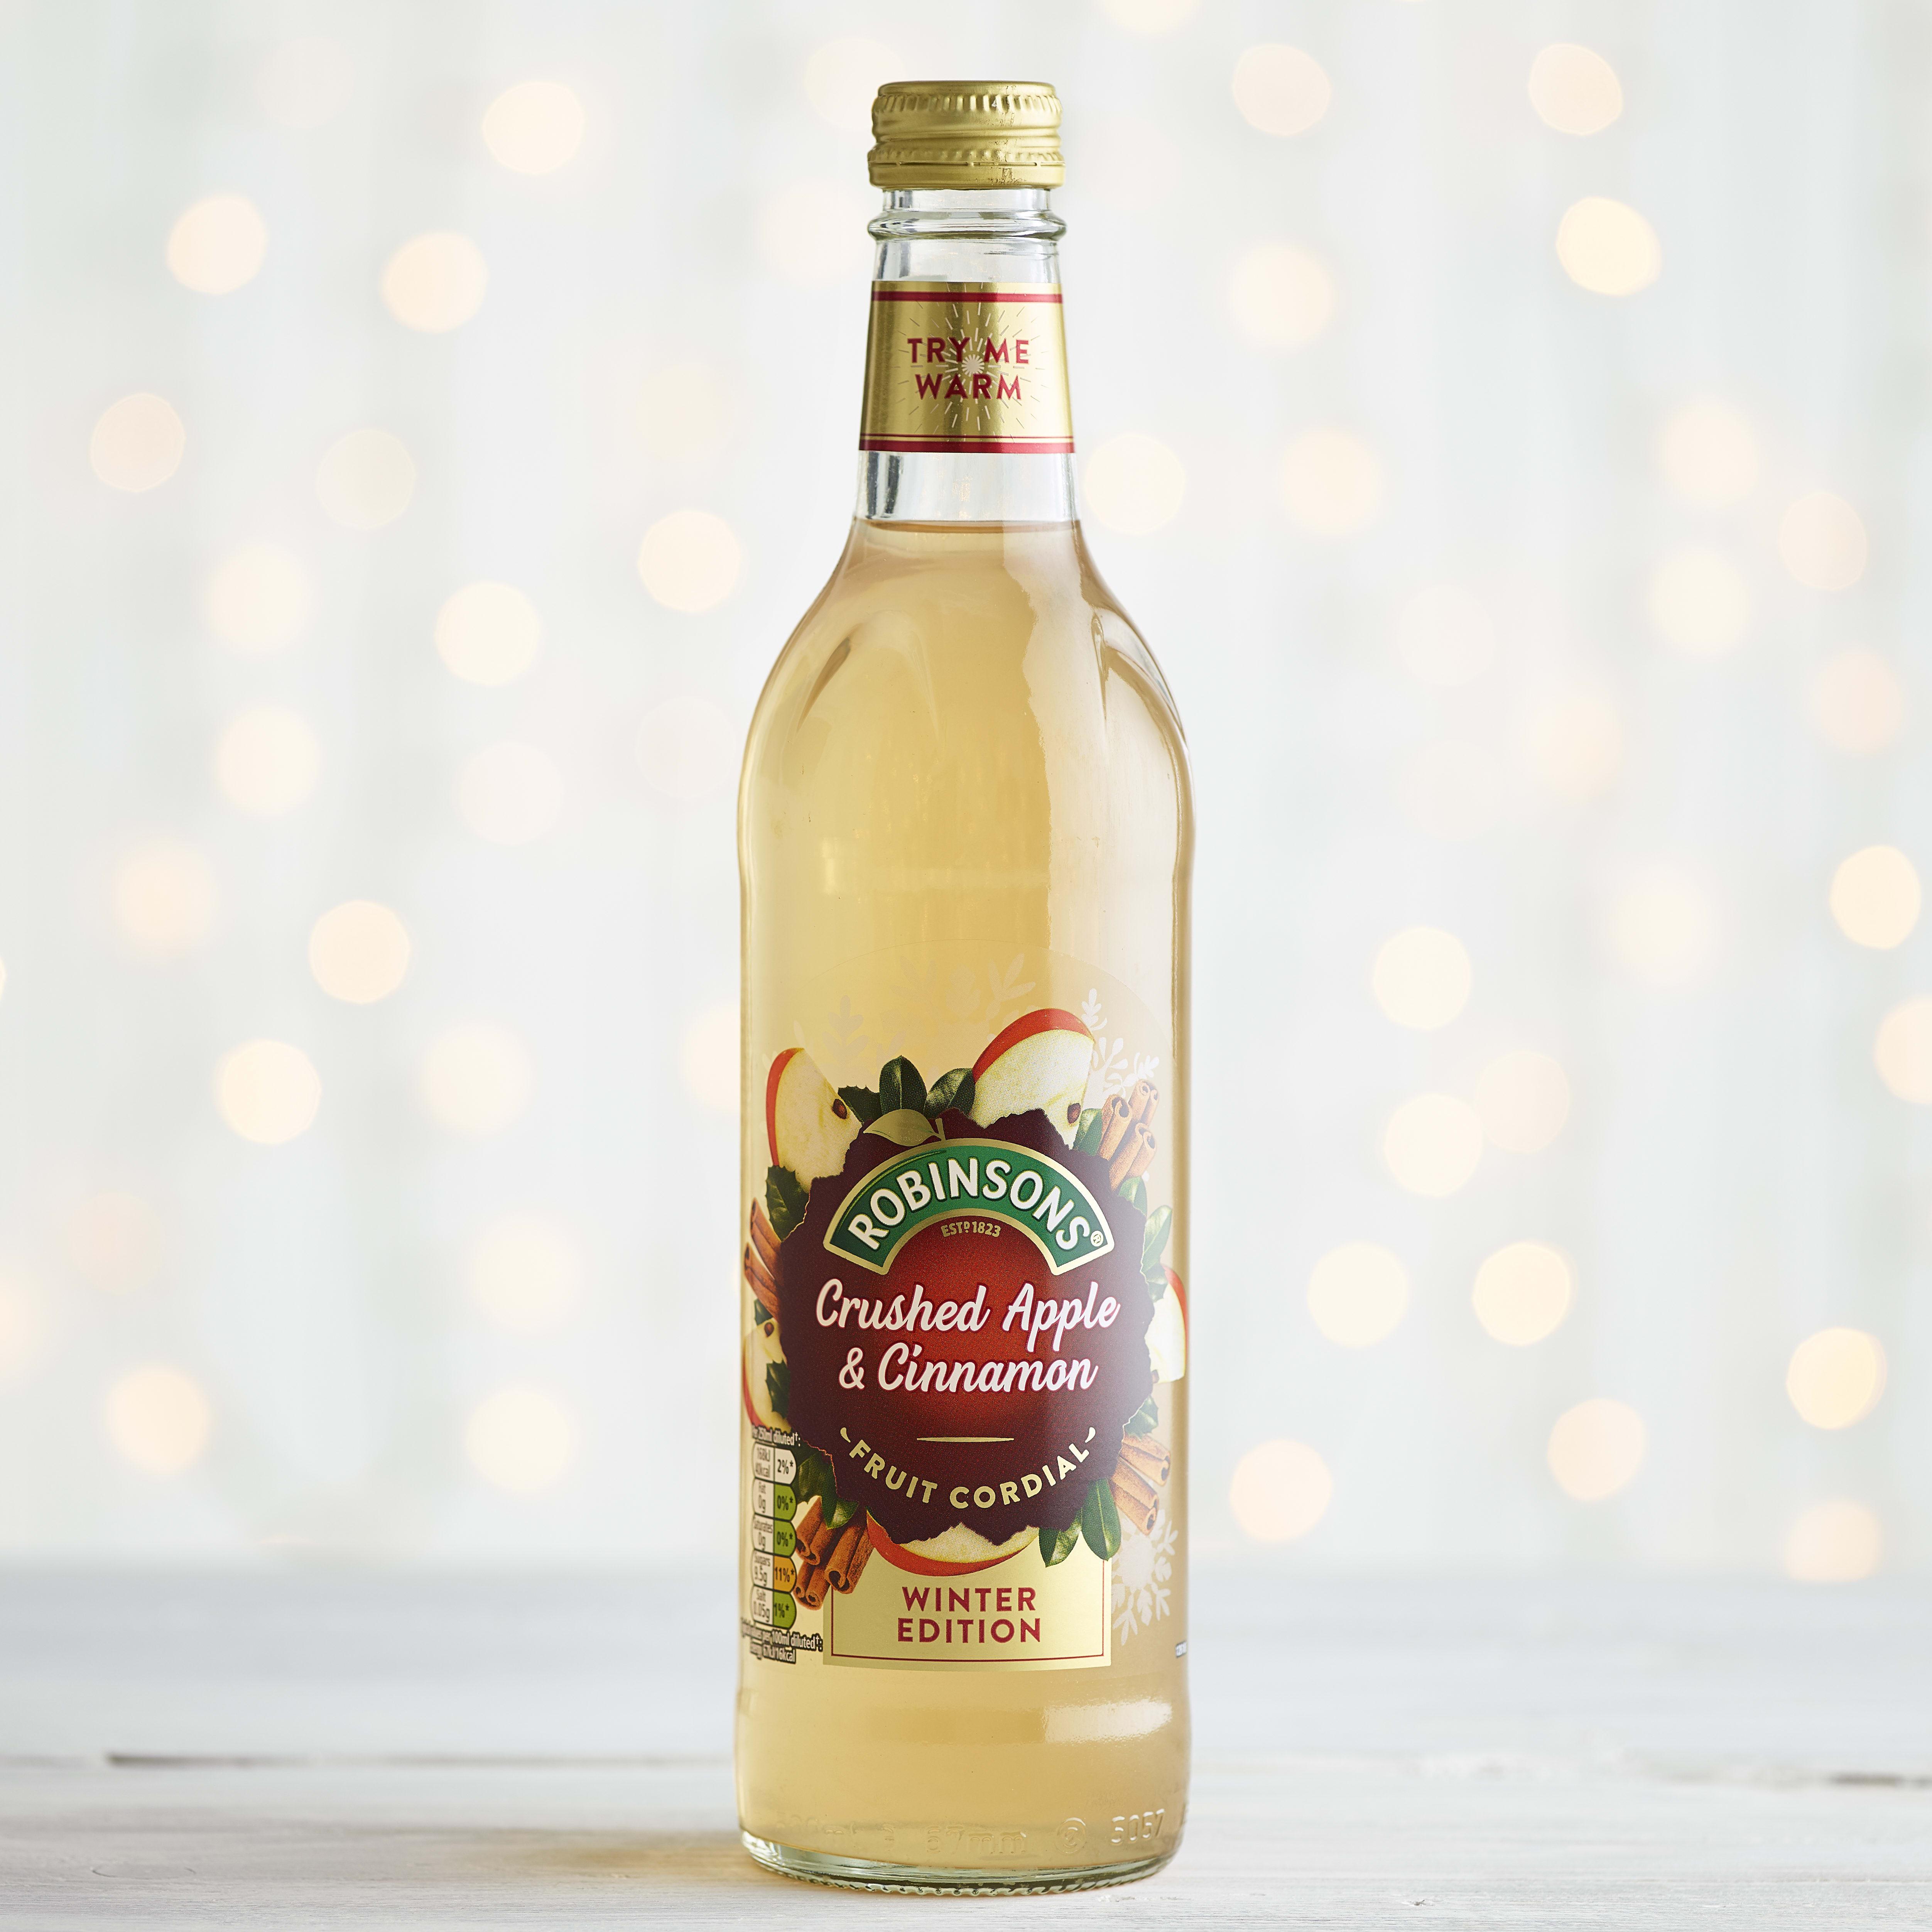 Robinsons Crushed Apple and Cinnamon Cordial, 500ml